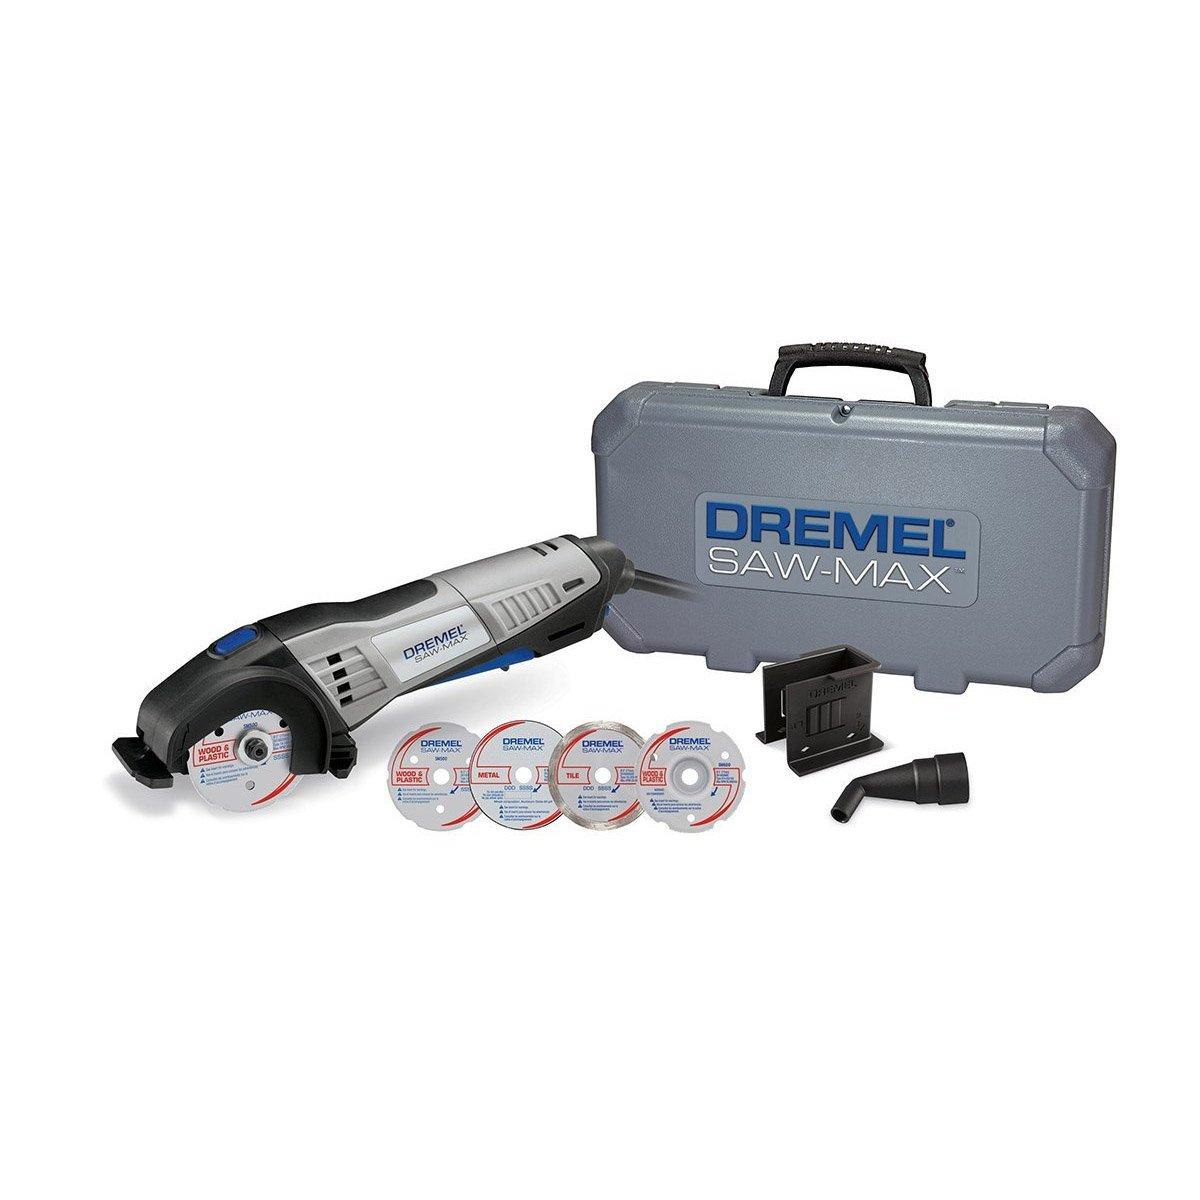 Dremel Saw-Max Kit 6.0 Amp 17000 Rpm